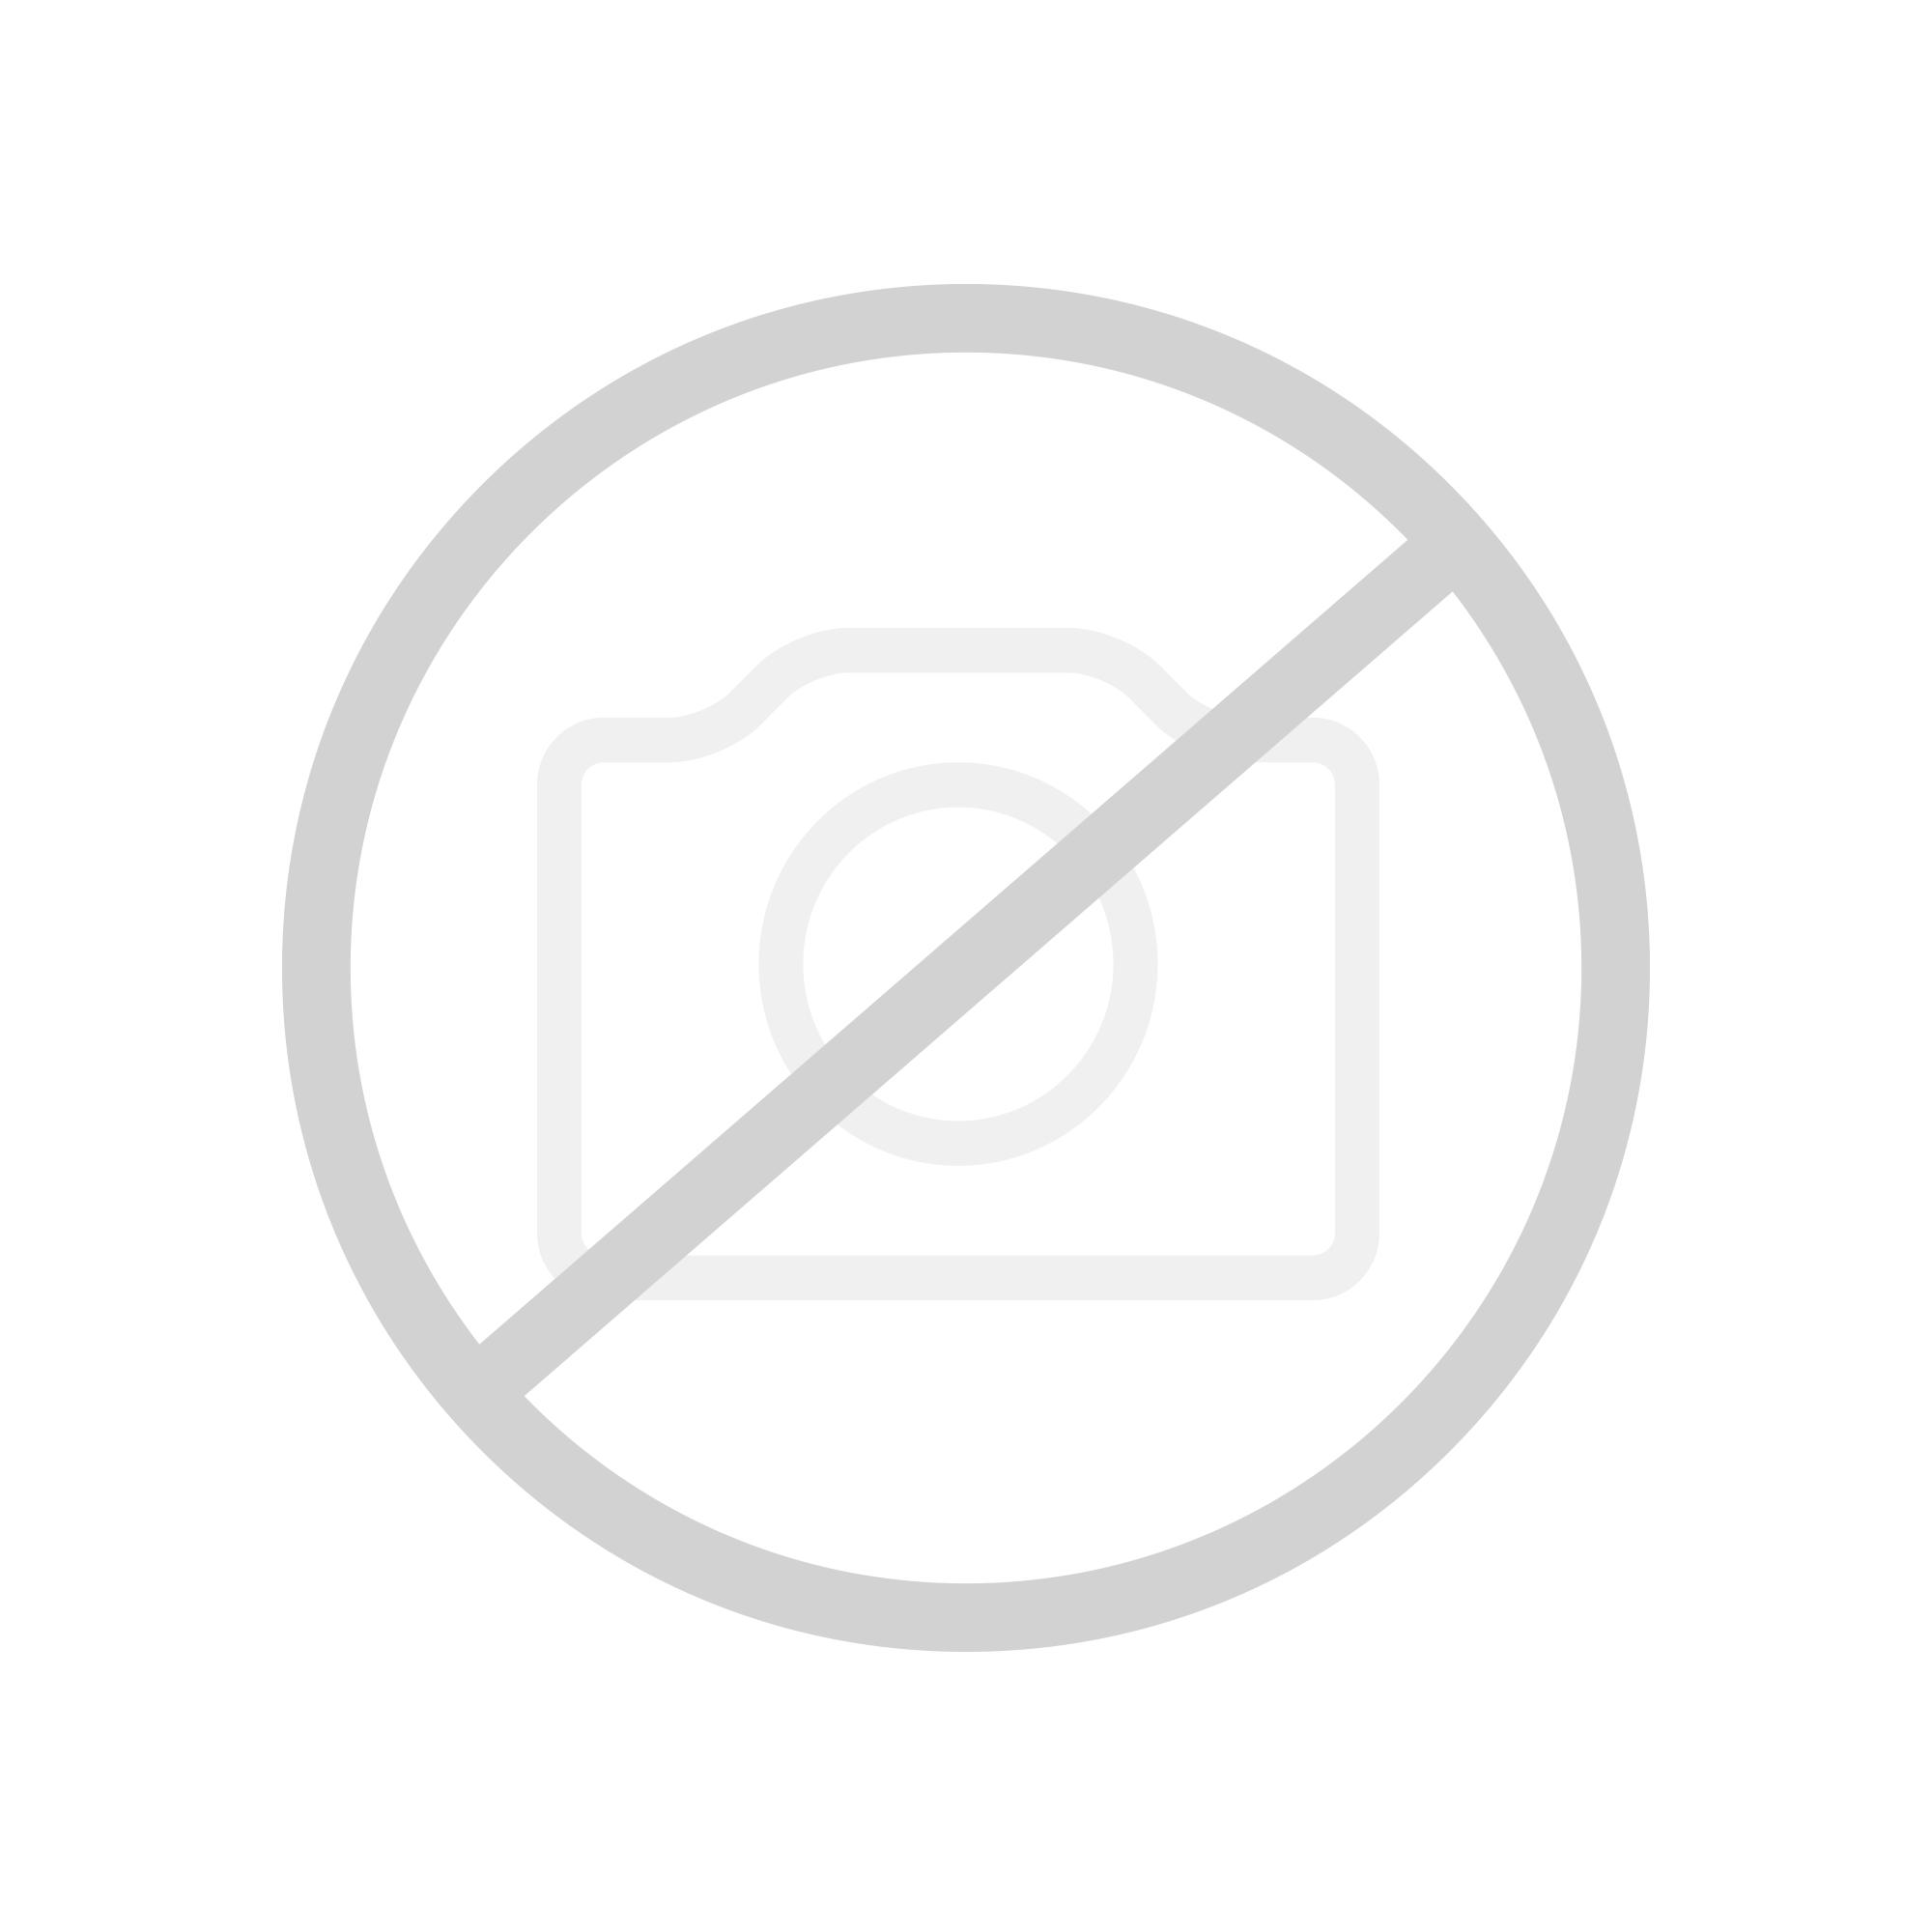 Viega Multiplex Ausstattungsset / Fertigset Visign M1 verchromt